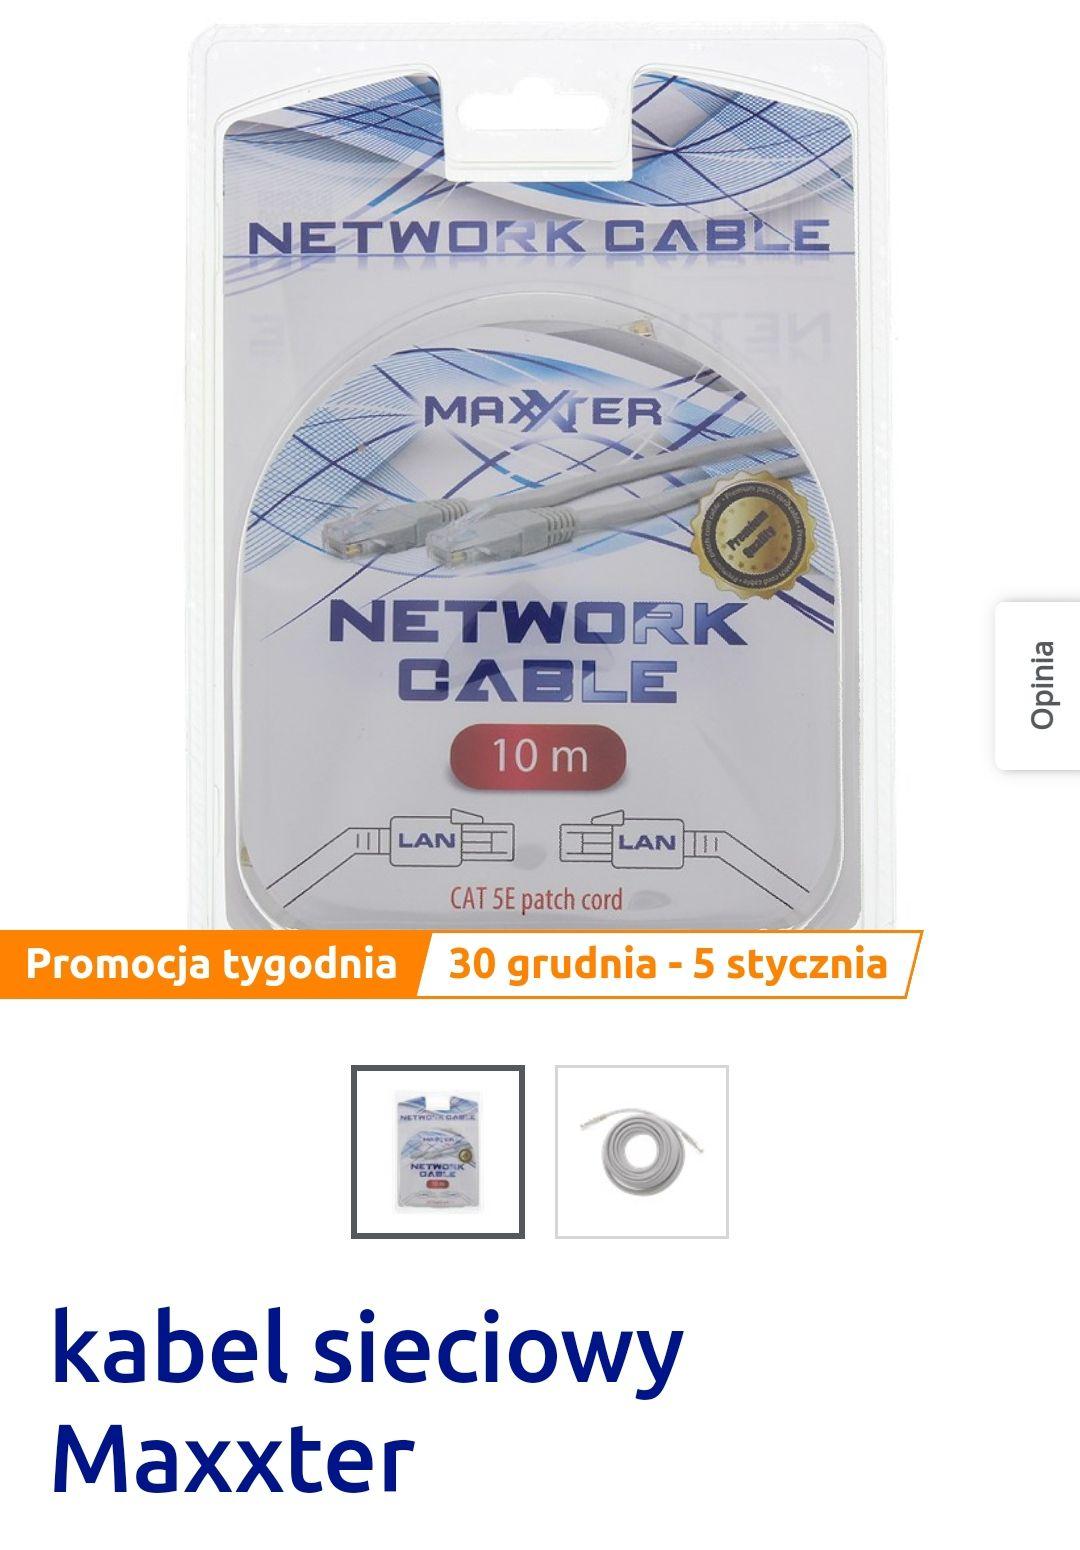 Kabel sieciowy Maxxter 10 M @Action